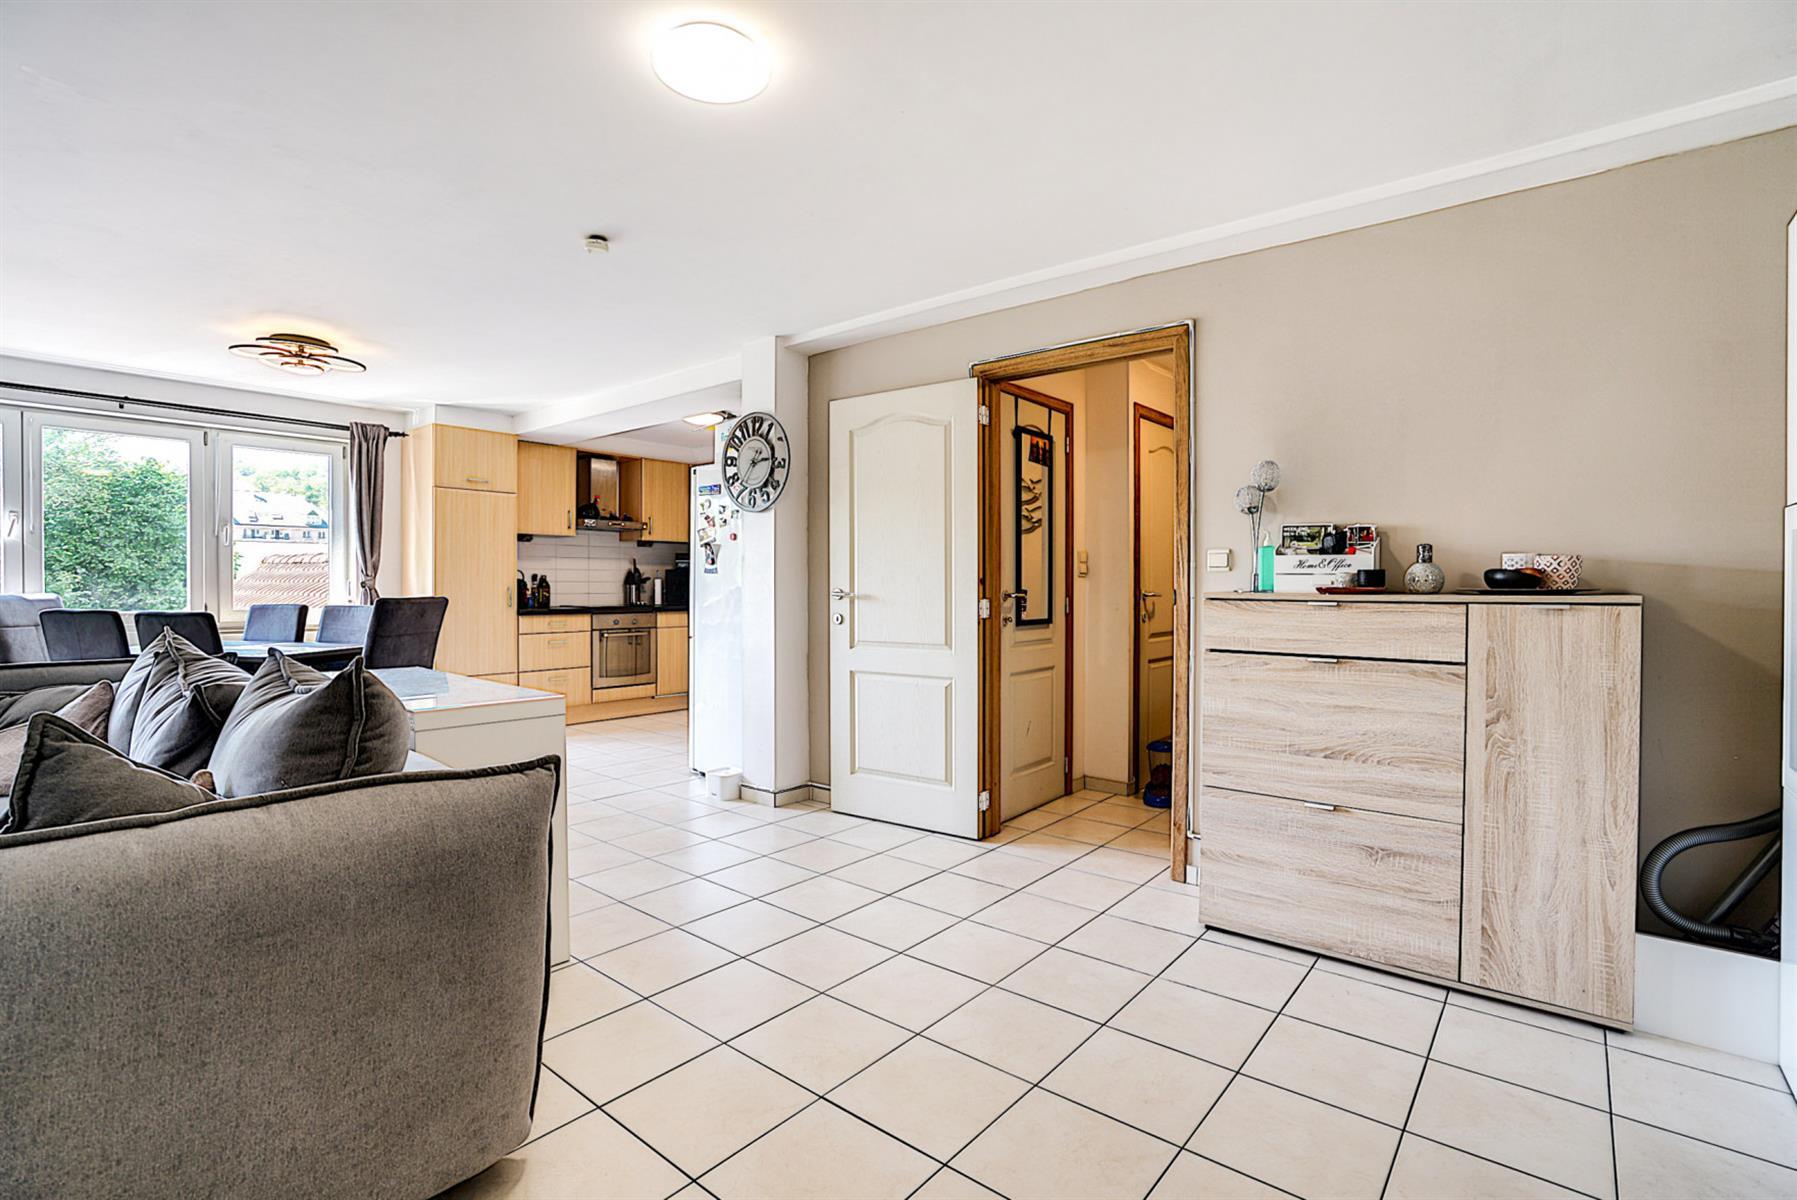 Appartement - Ottignies - #4410761-8